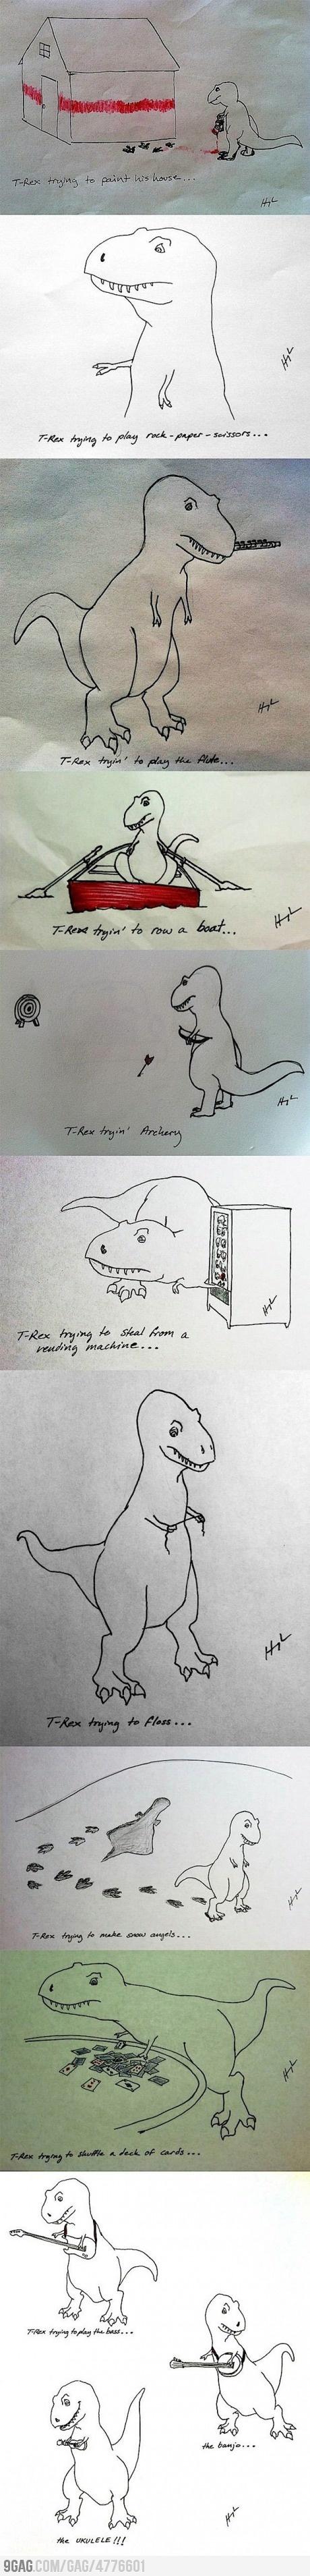 Poor T-Rex... not anymore!